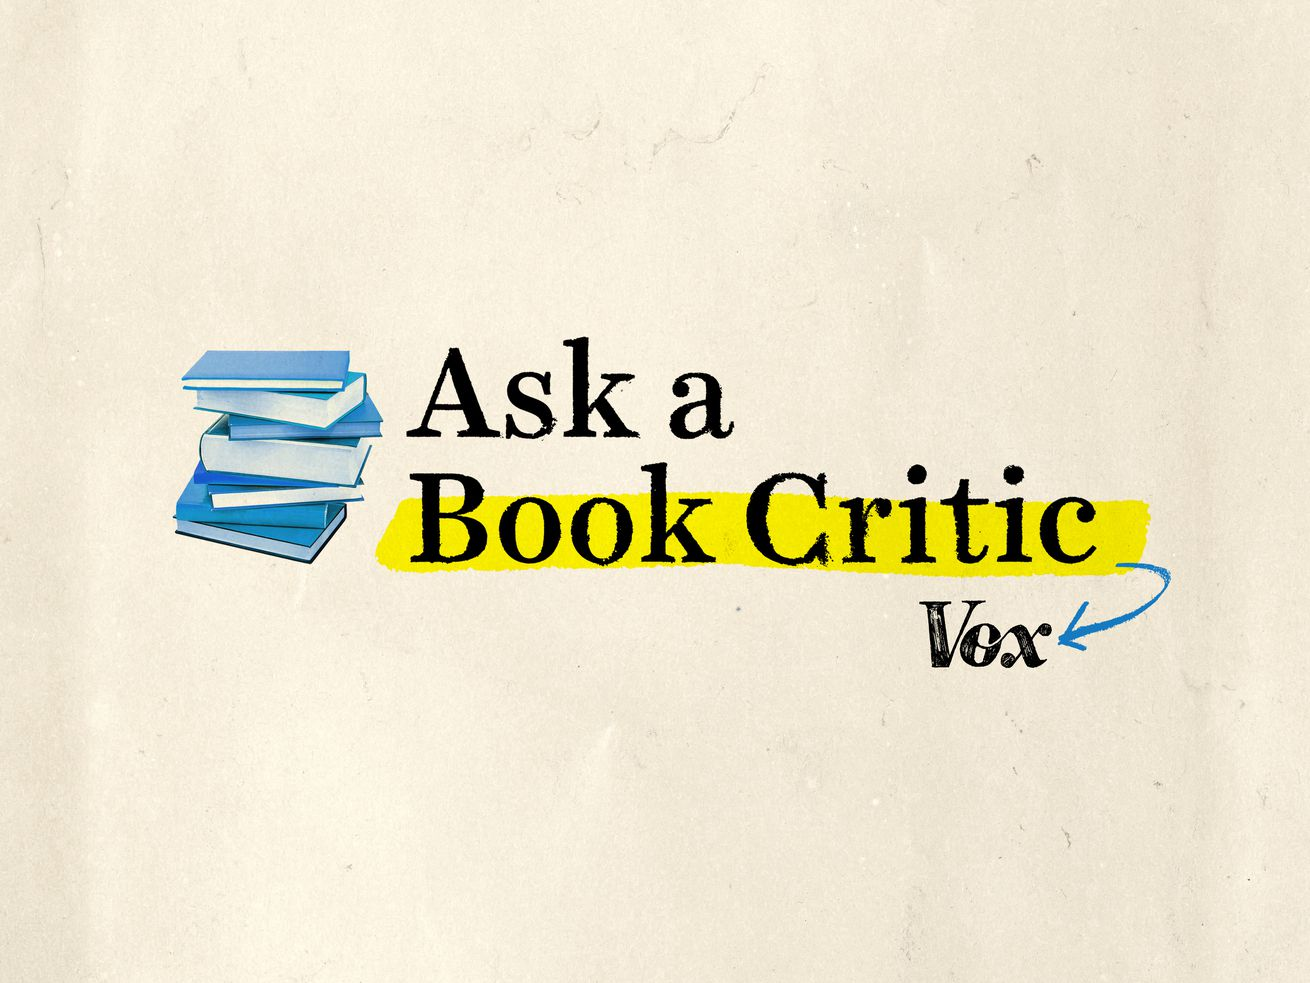 Ask a Book Critic